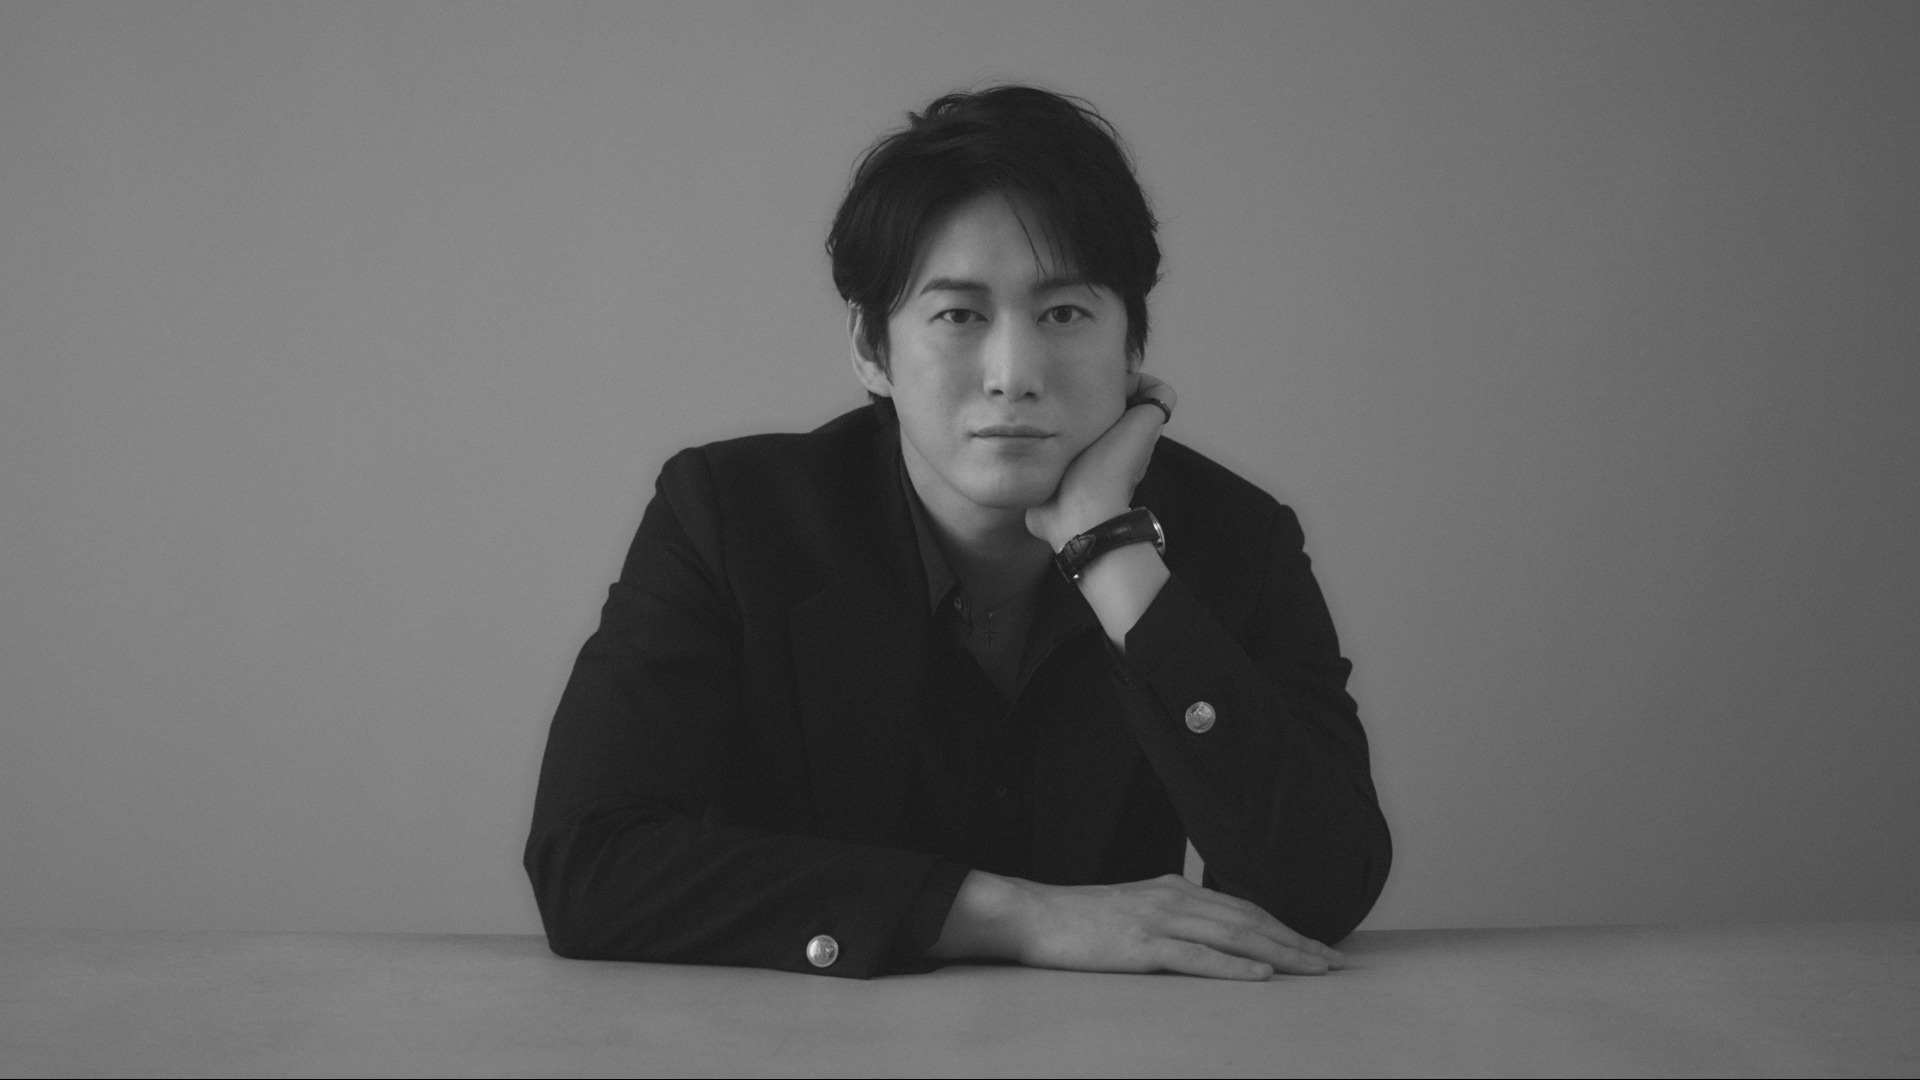 宮尾俊太郎 - Shuntaro Miyao -